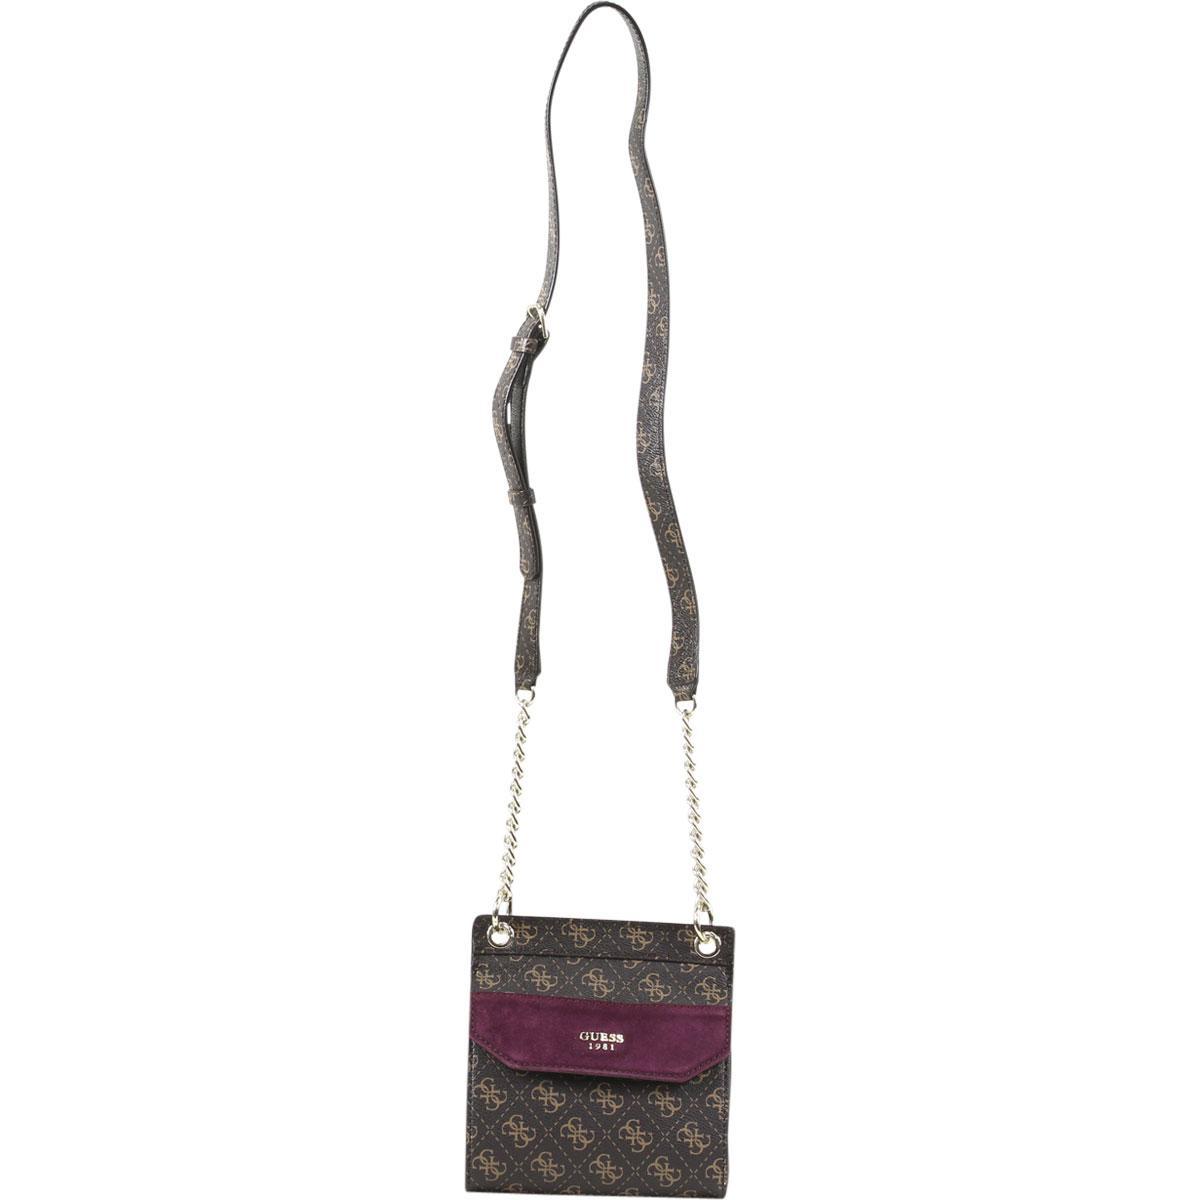 9eb8564f75b Guess Women s Tepper Mini Crossbody Handbag